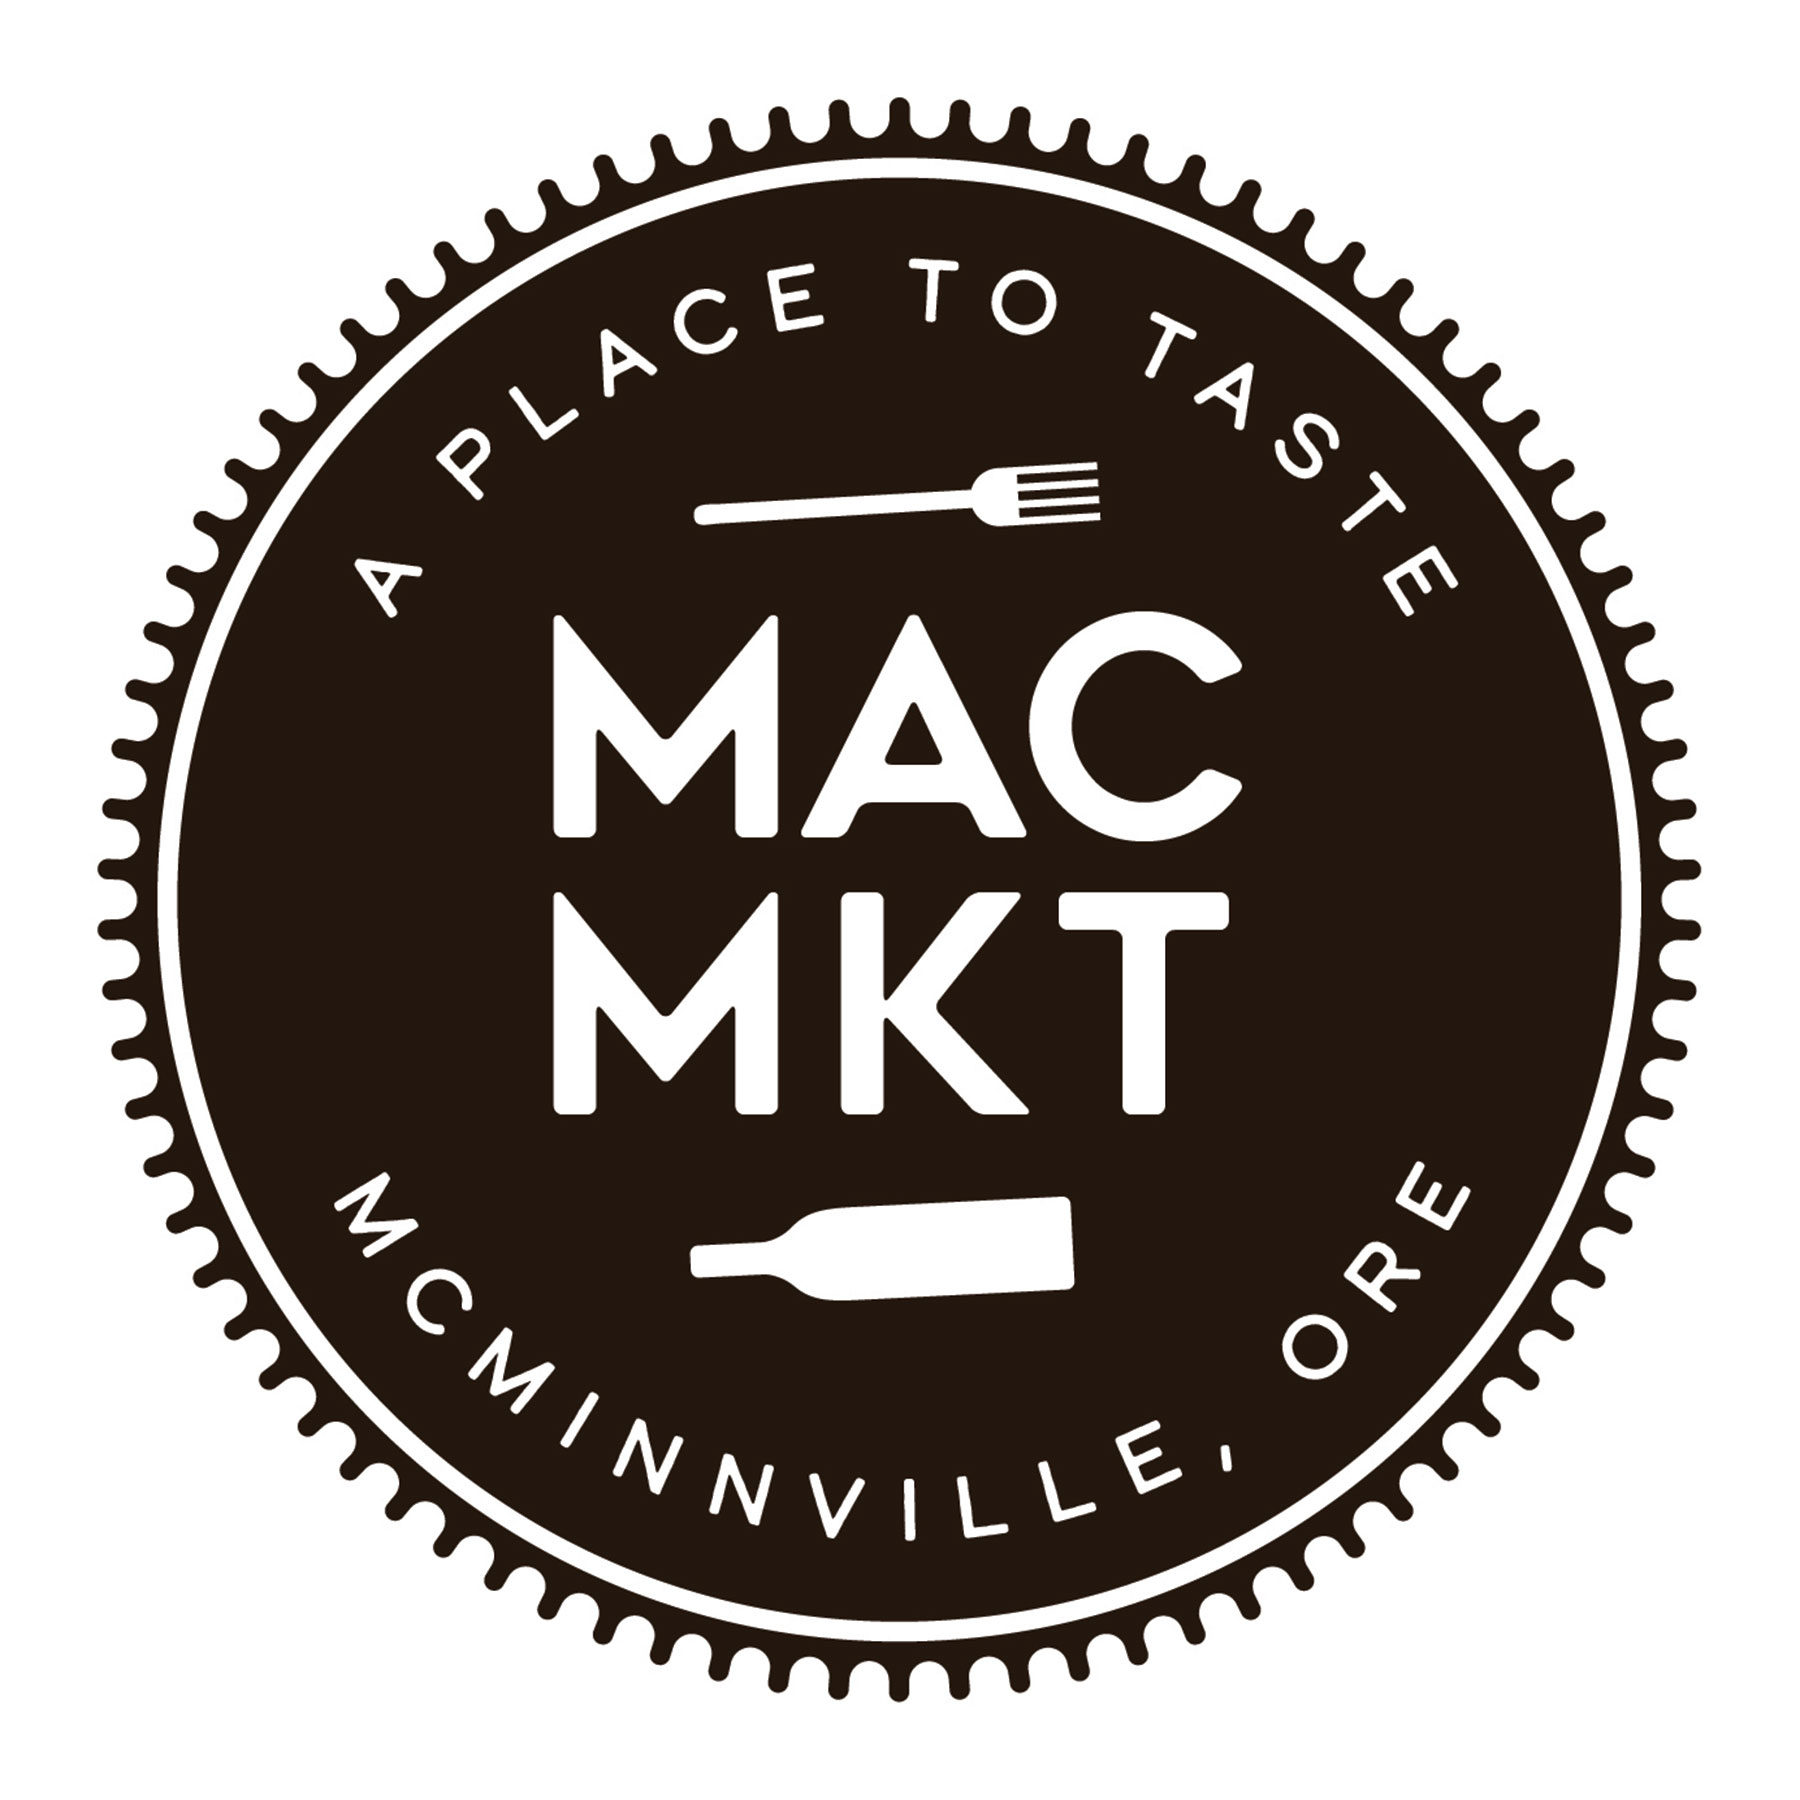 Mac Market McMinnville Oregon